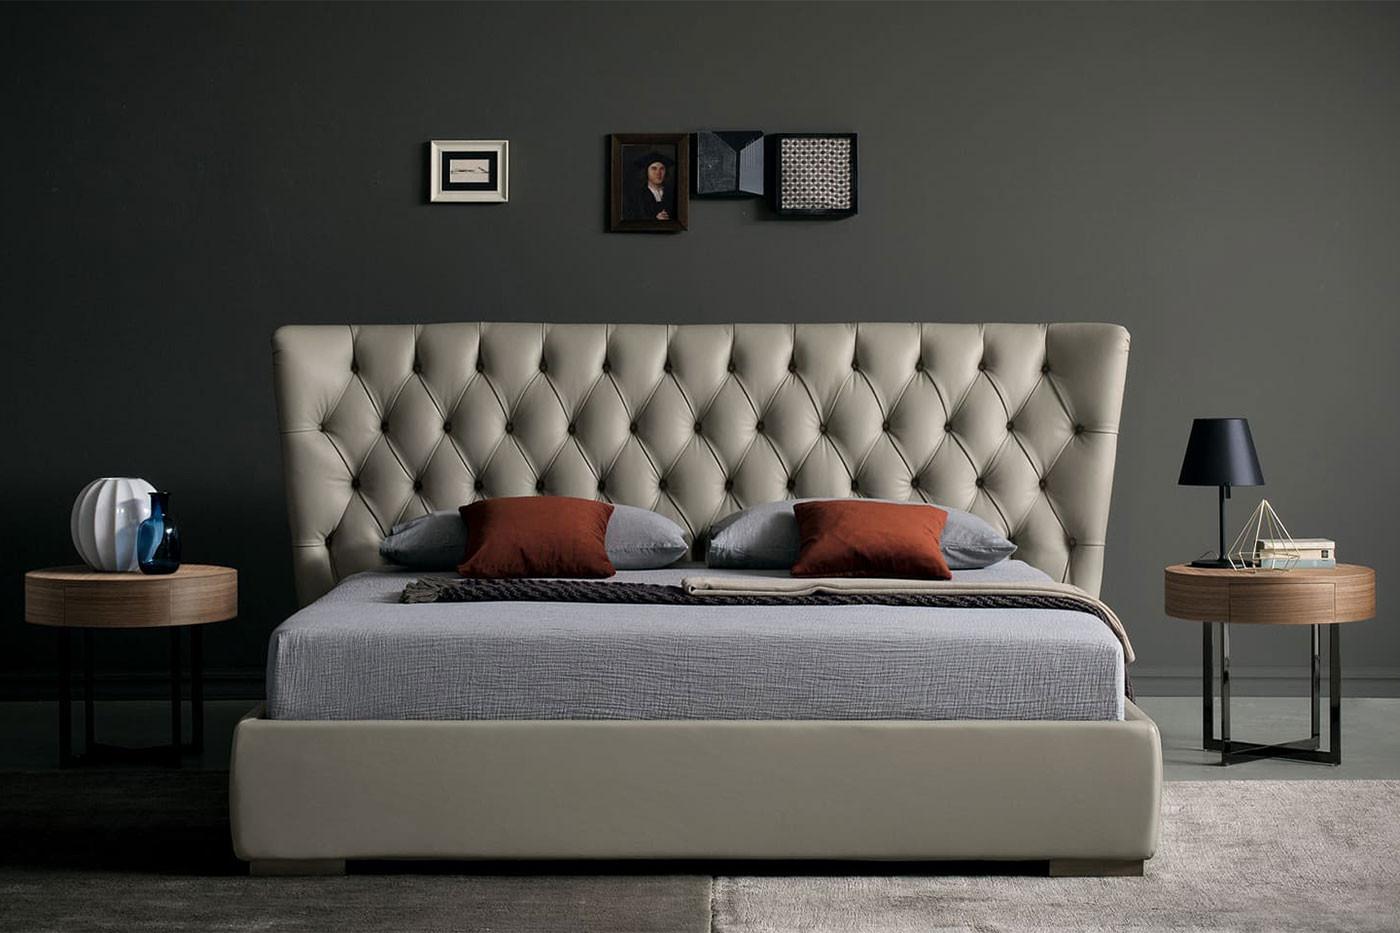 Elegantes Doppelbett mit hohem Capitonné-Kopfteil, in Leder, Samt oder Stoff